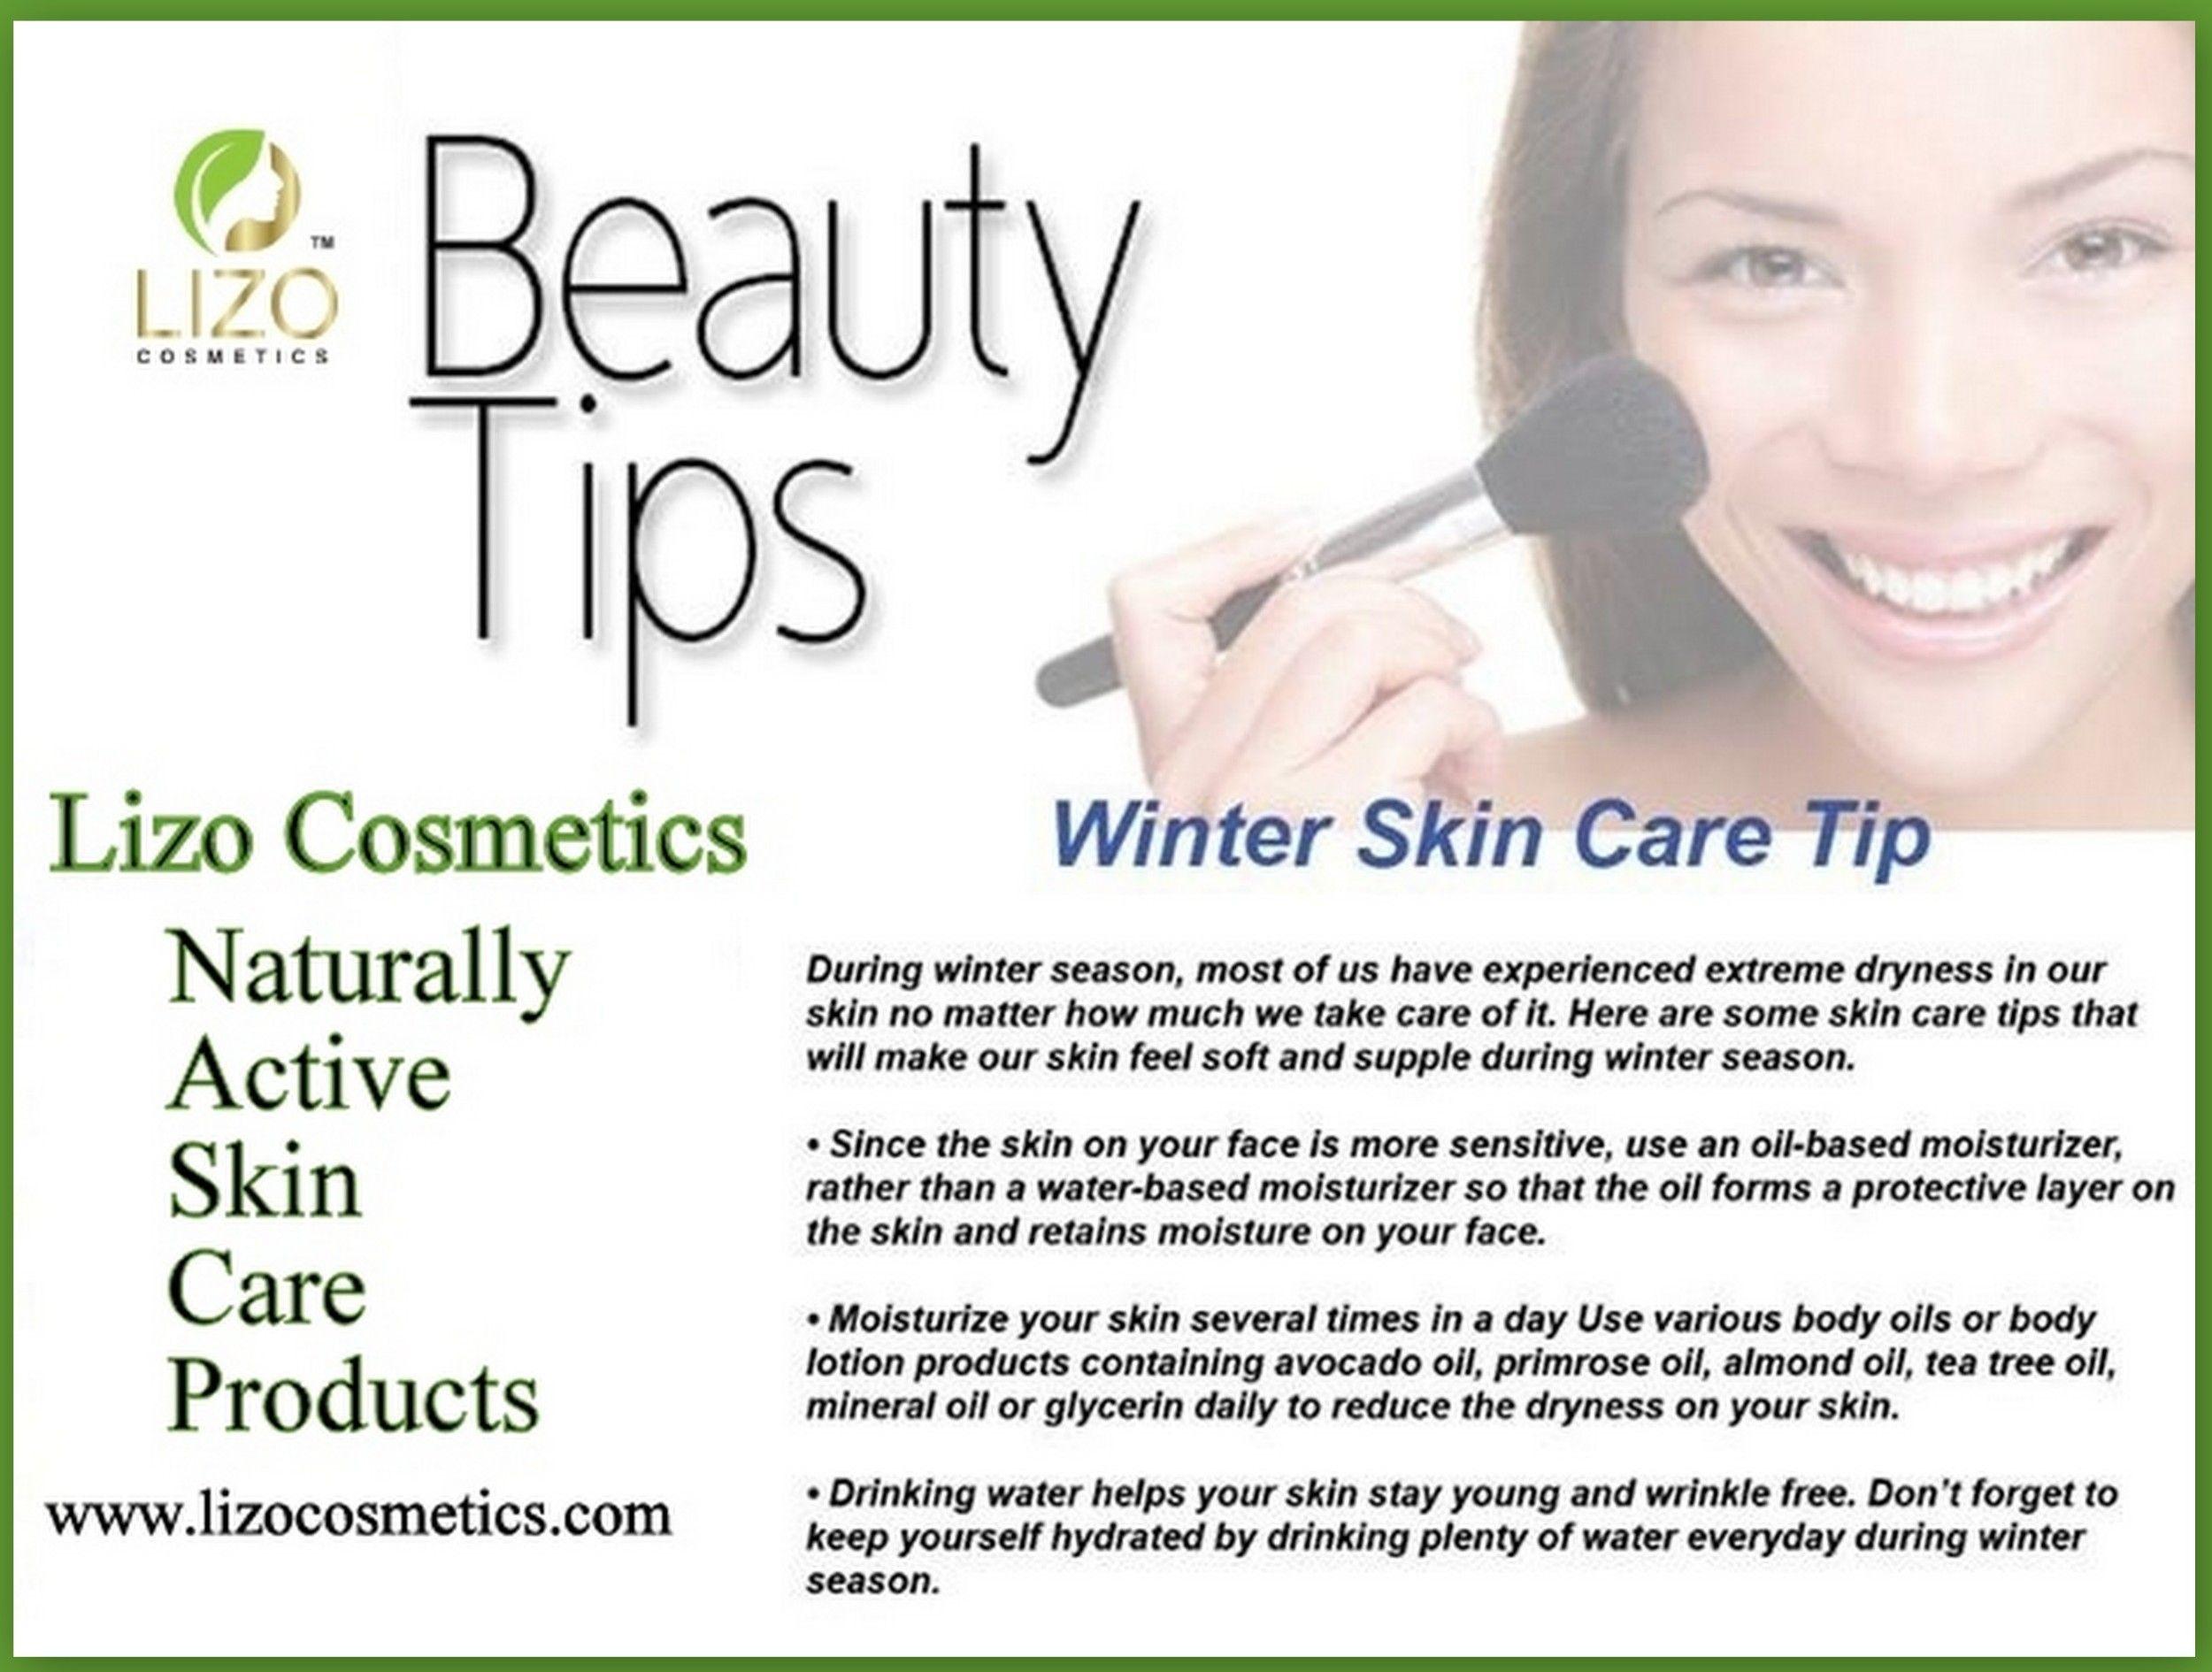 Pin By Lizo Cosmetics On Beauty Tips Winter Skin Care Winter Skin Beauty Hacks